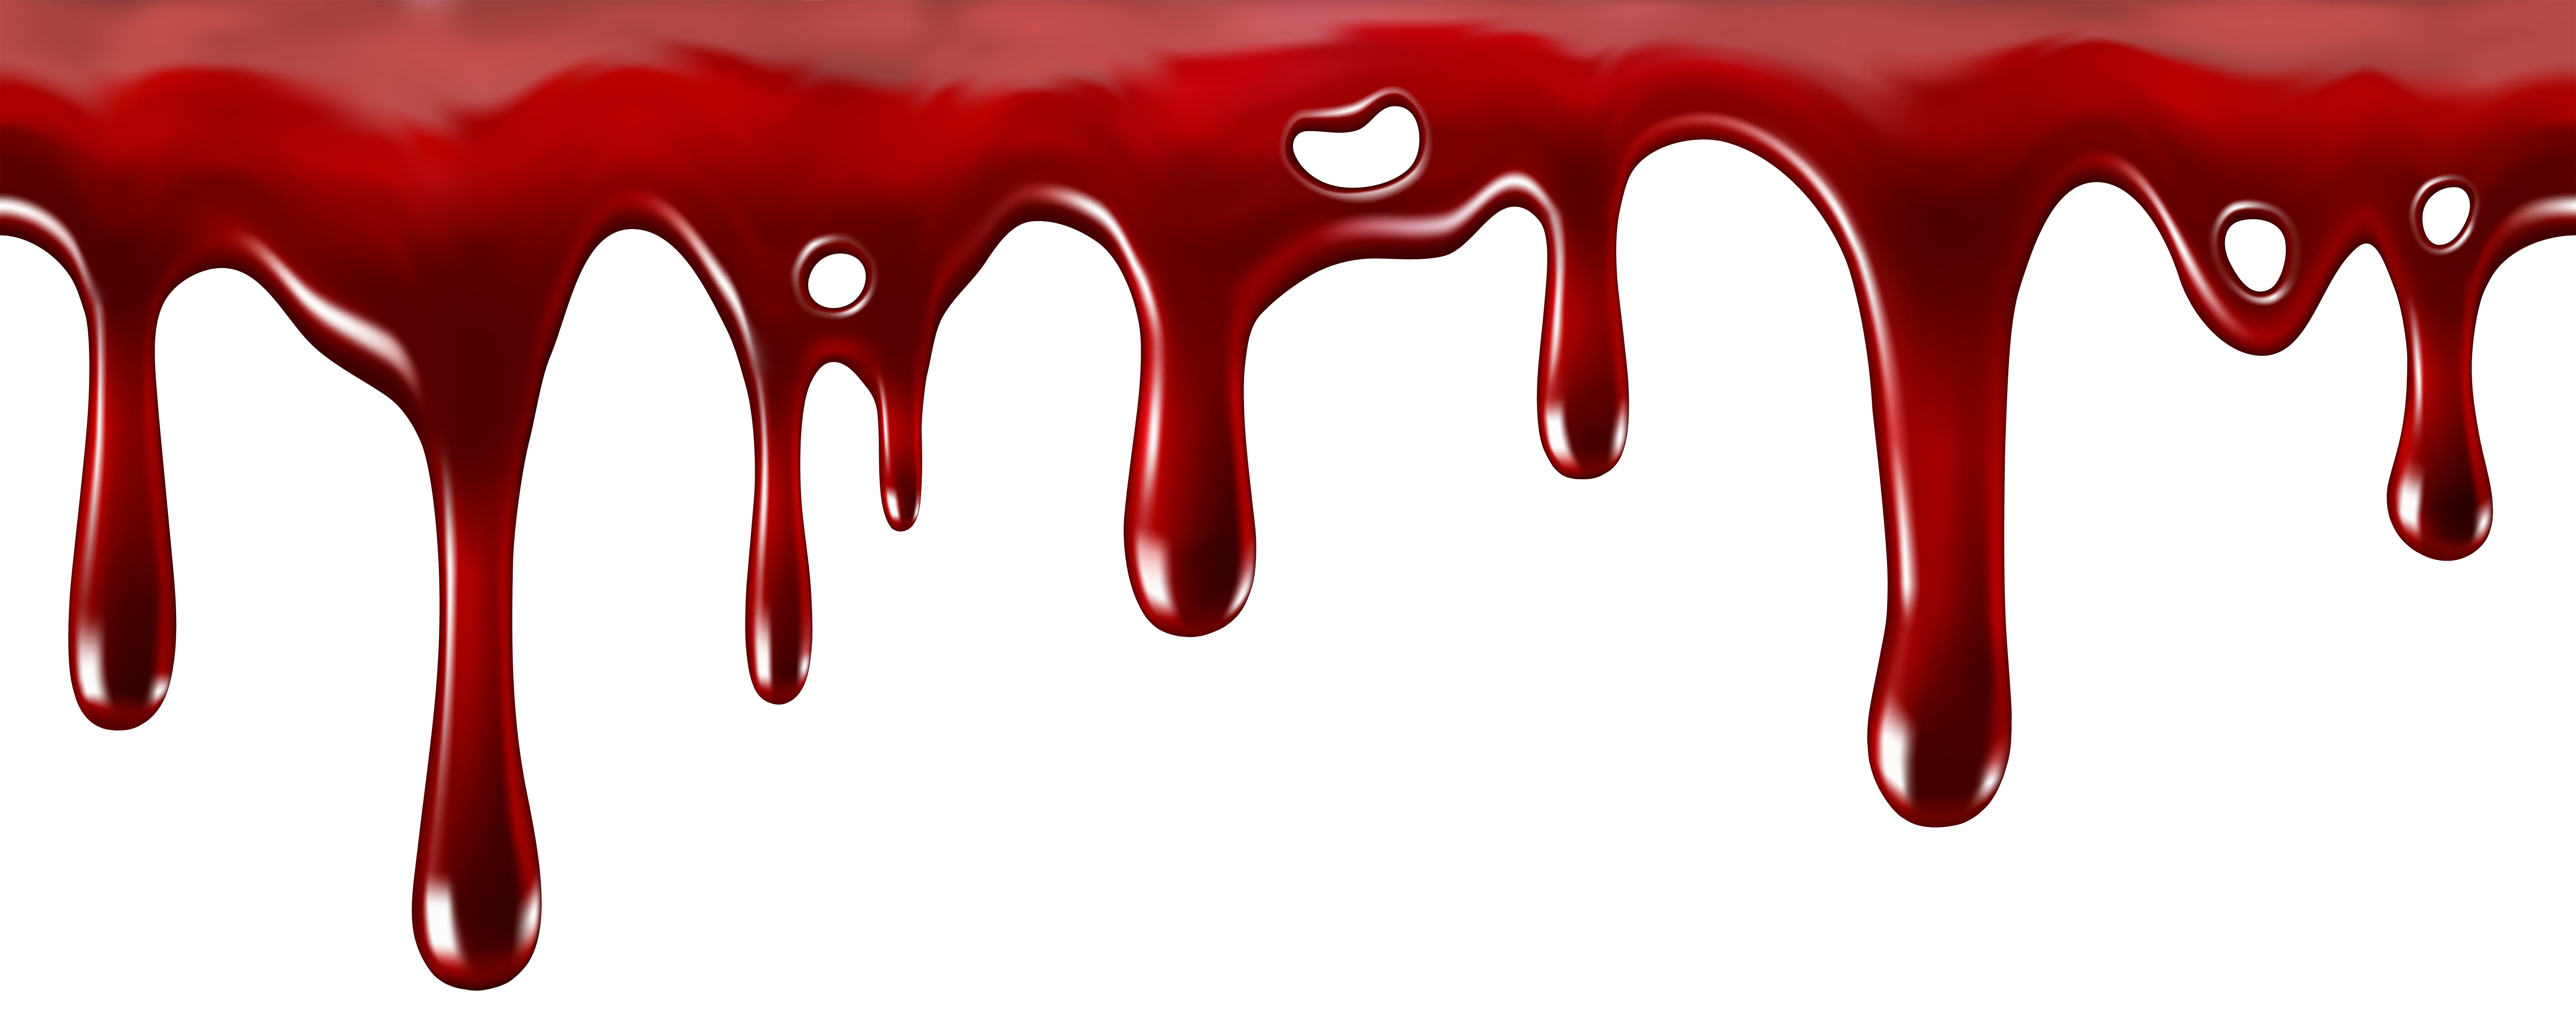 Blood clipart transparent. Heart viva brazil glasgow